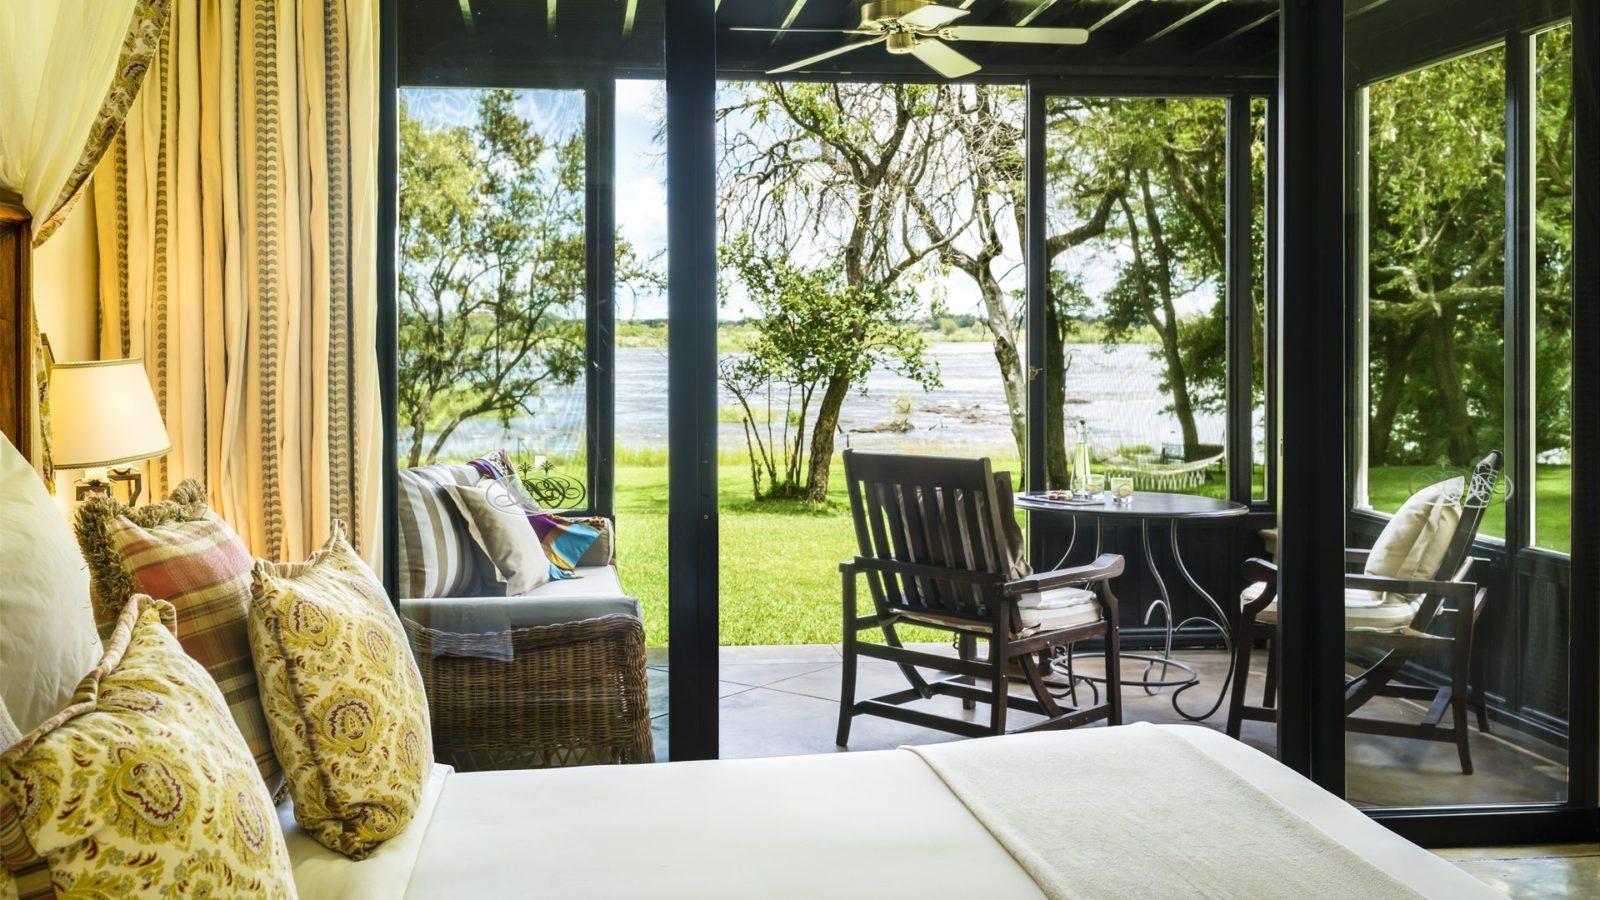 Corner-Deluxe-Room-at-Royal-Livingstone-Hotel-by-Anantara-1600x900.jpg